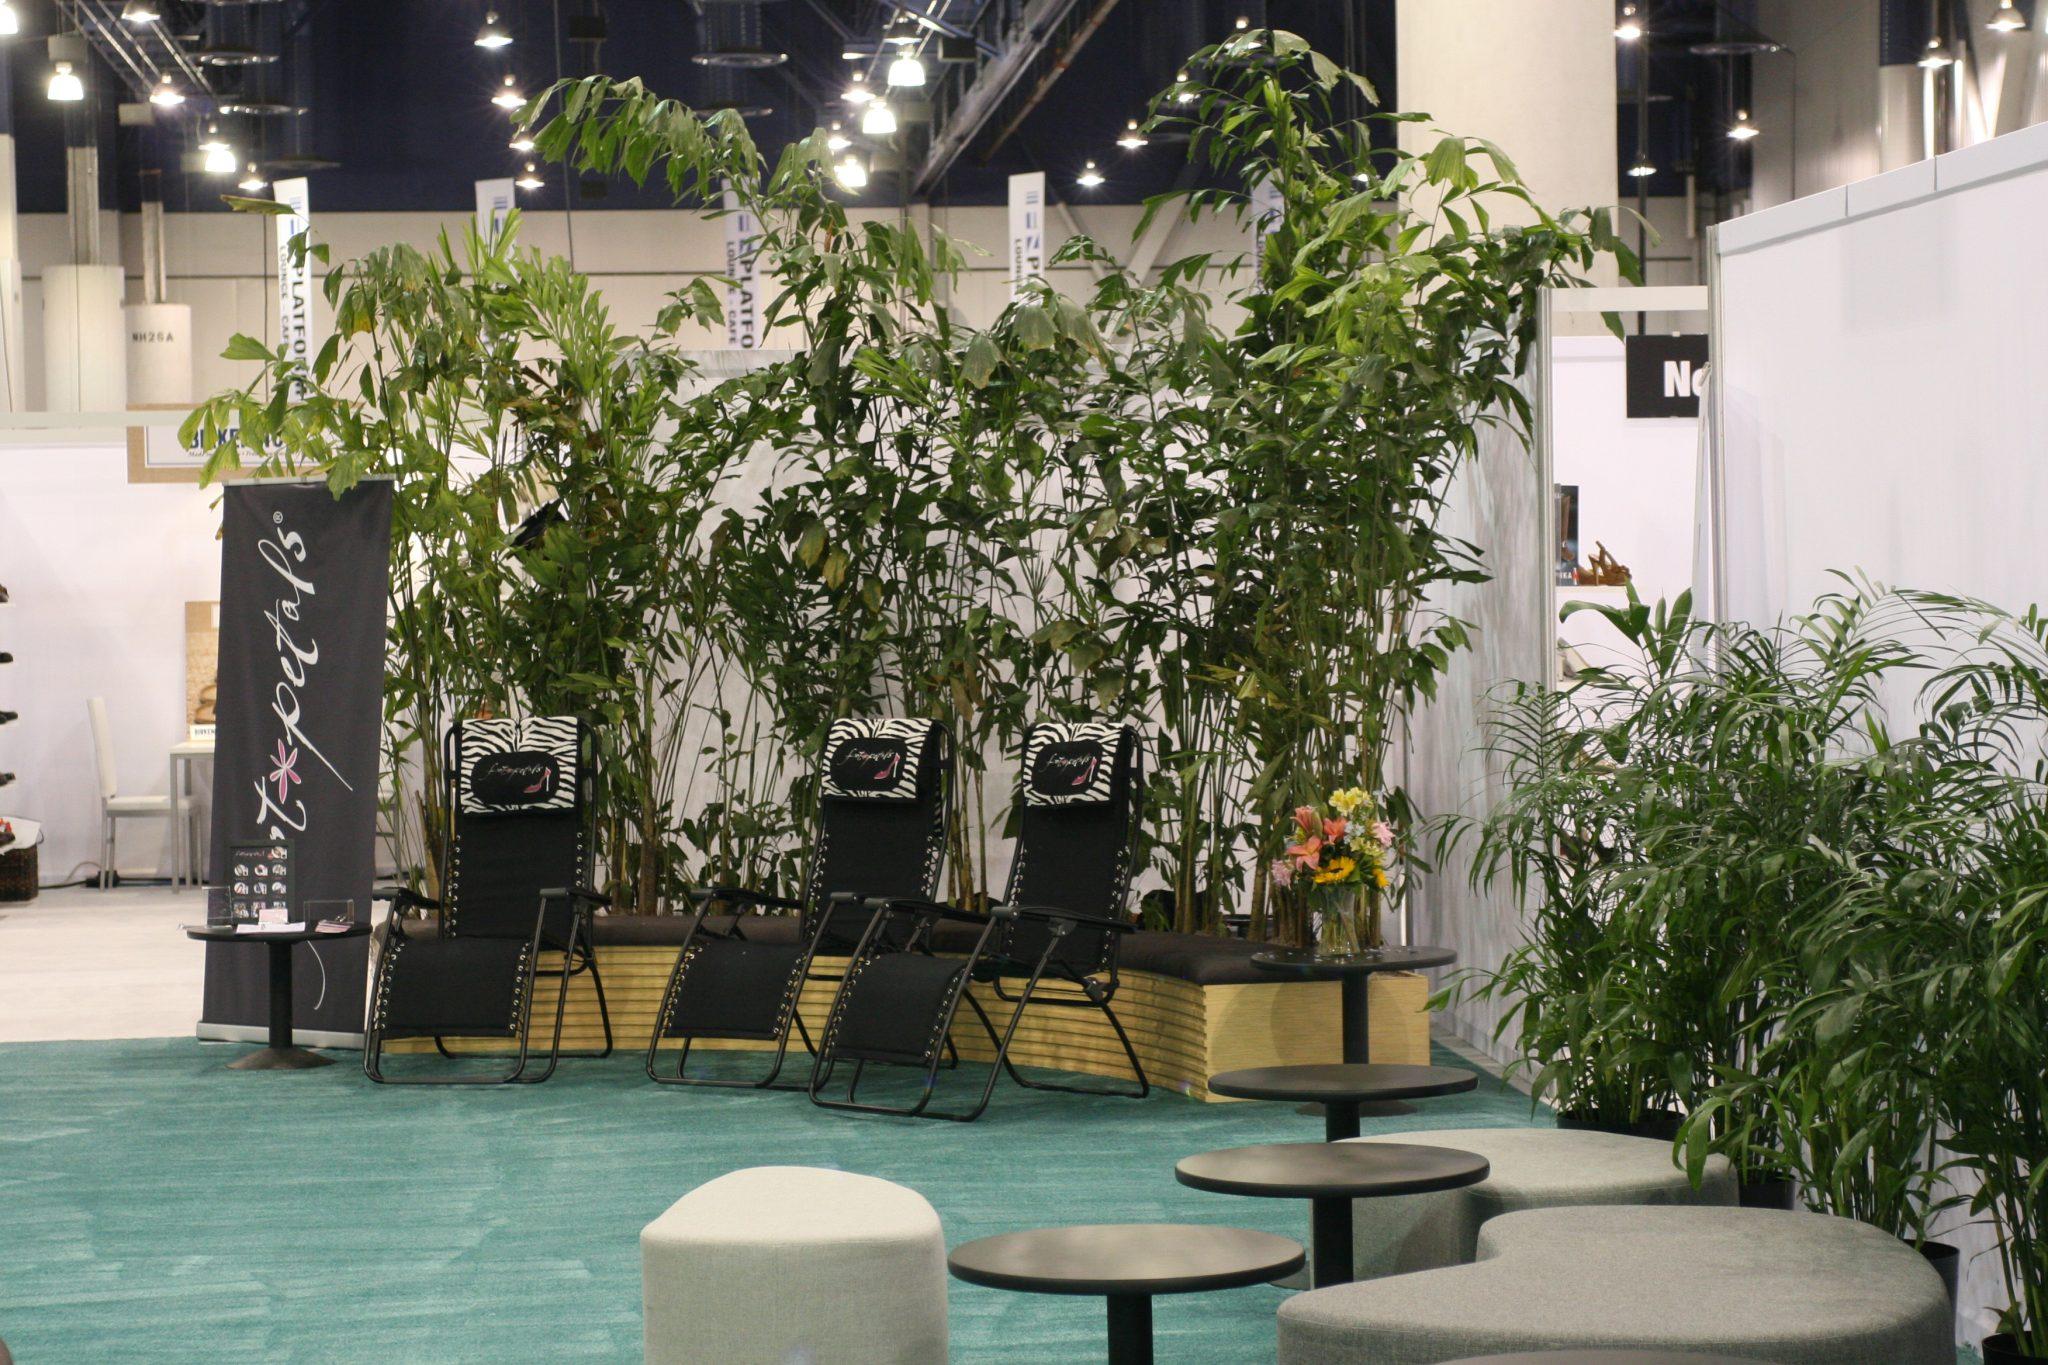 Plant wall for las vegas conferences.